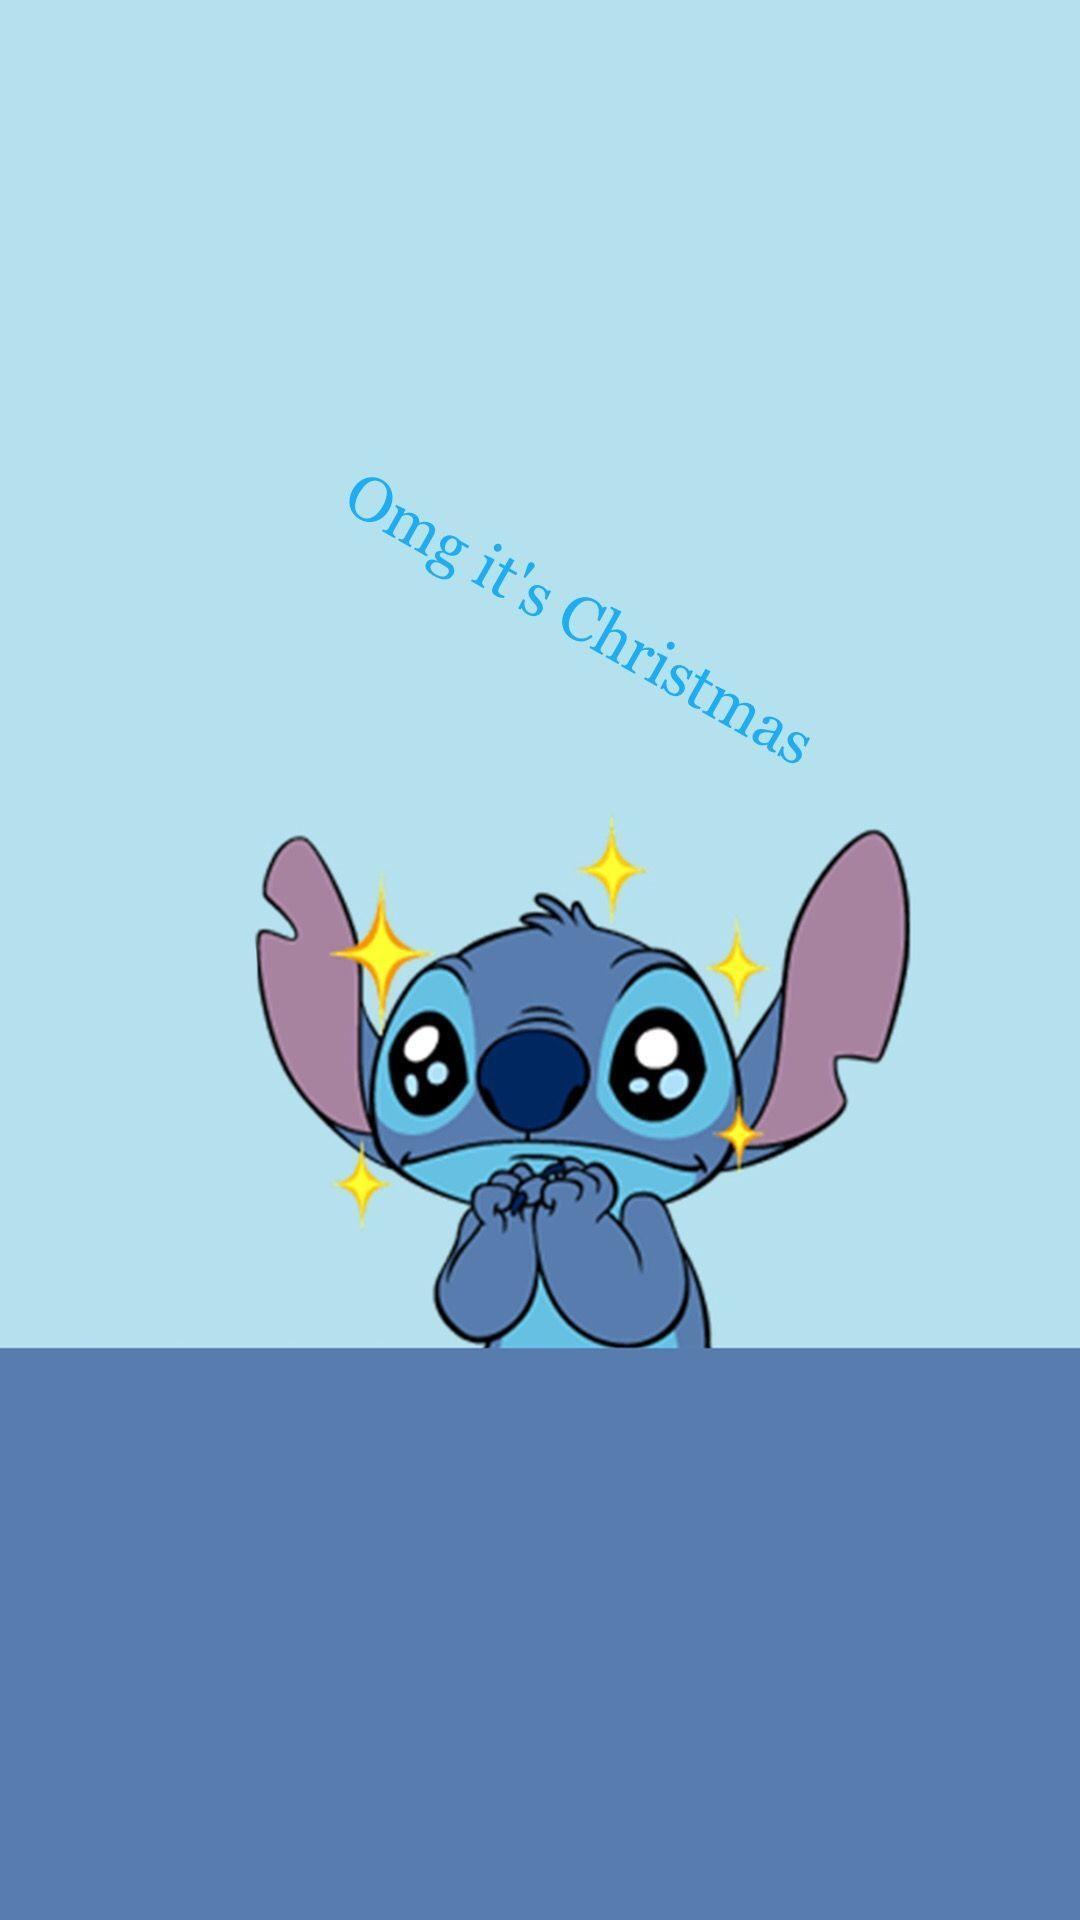 Lilo And Stitch Christmas Wallpaper : stitch, christmas, wallpaper, Christmas, Stitch, Wallpapers, Backgrounds, WallpaperAccess